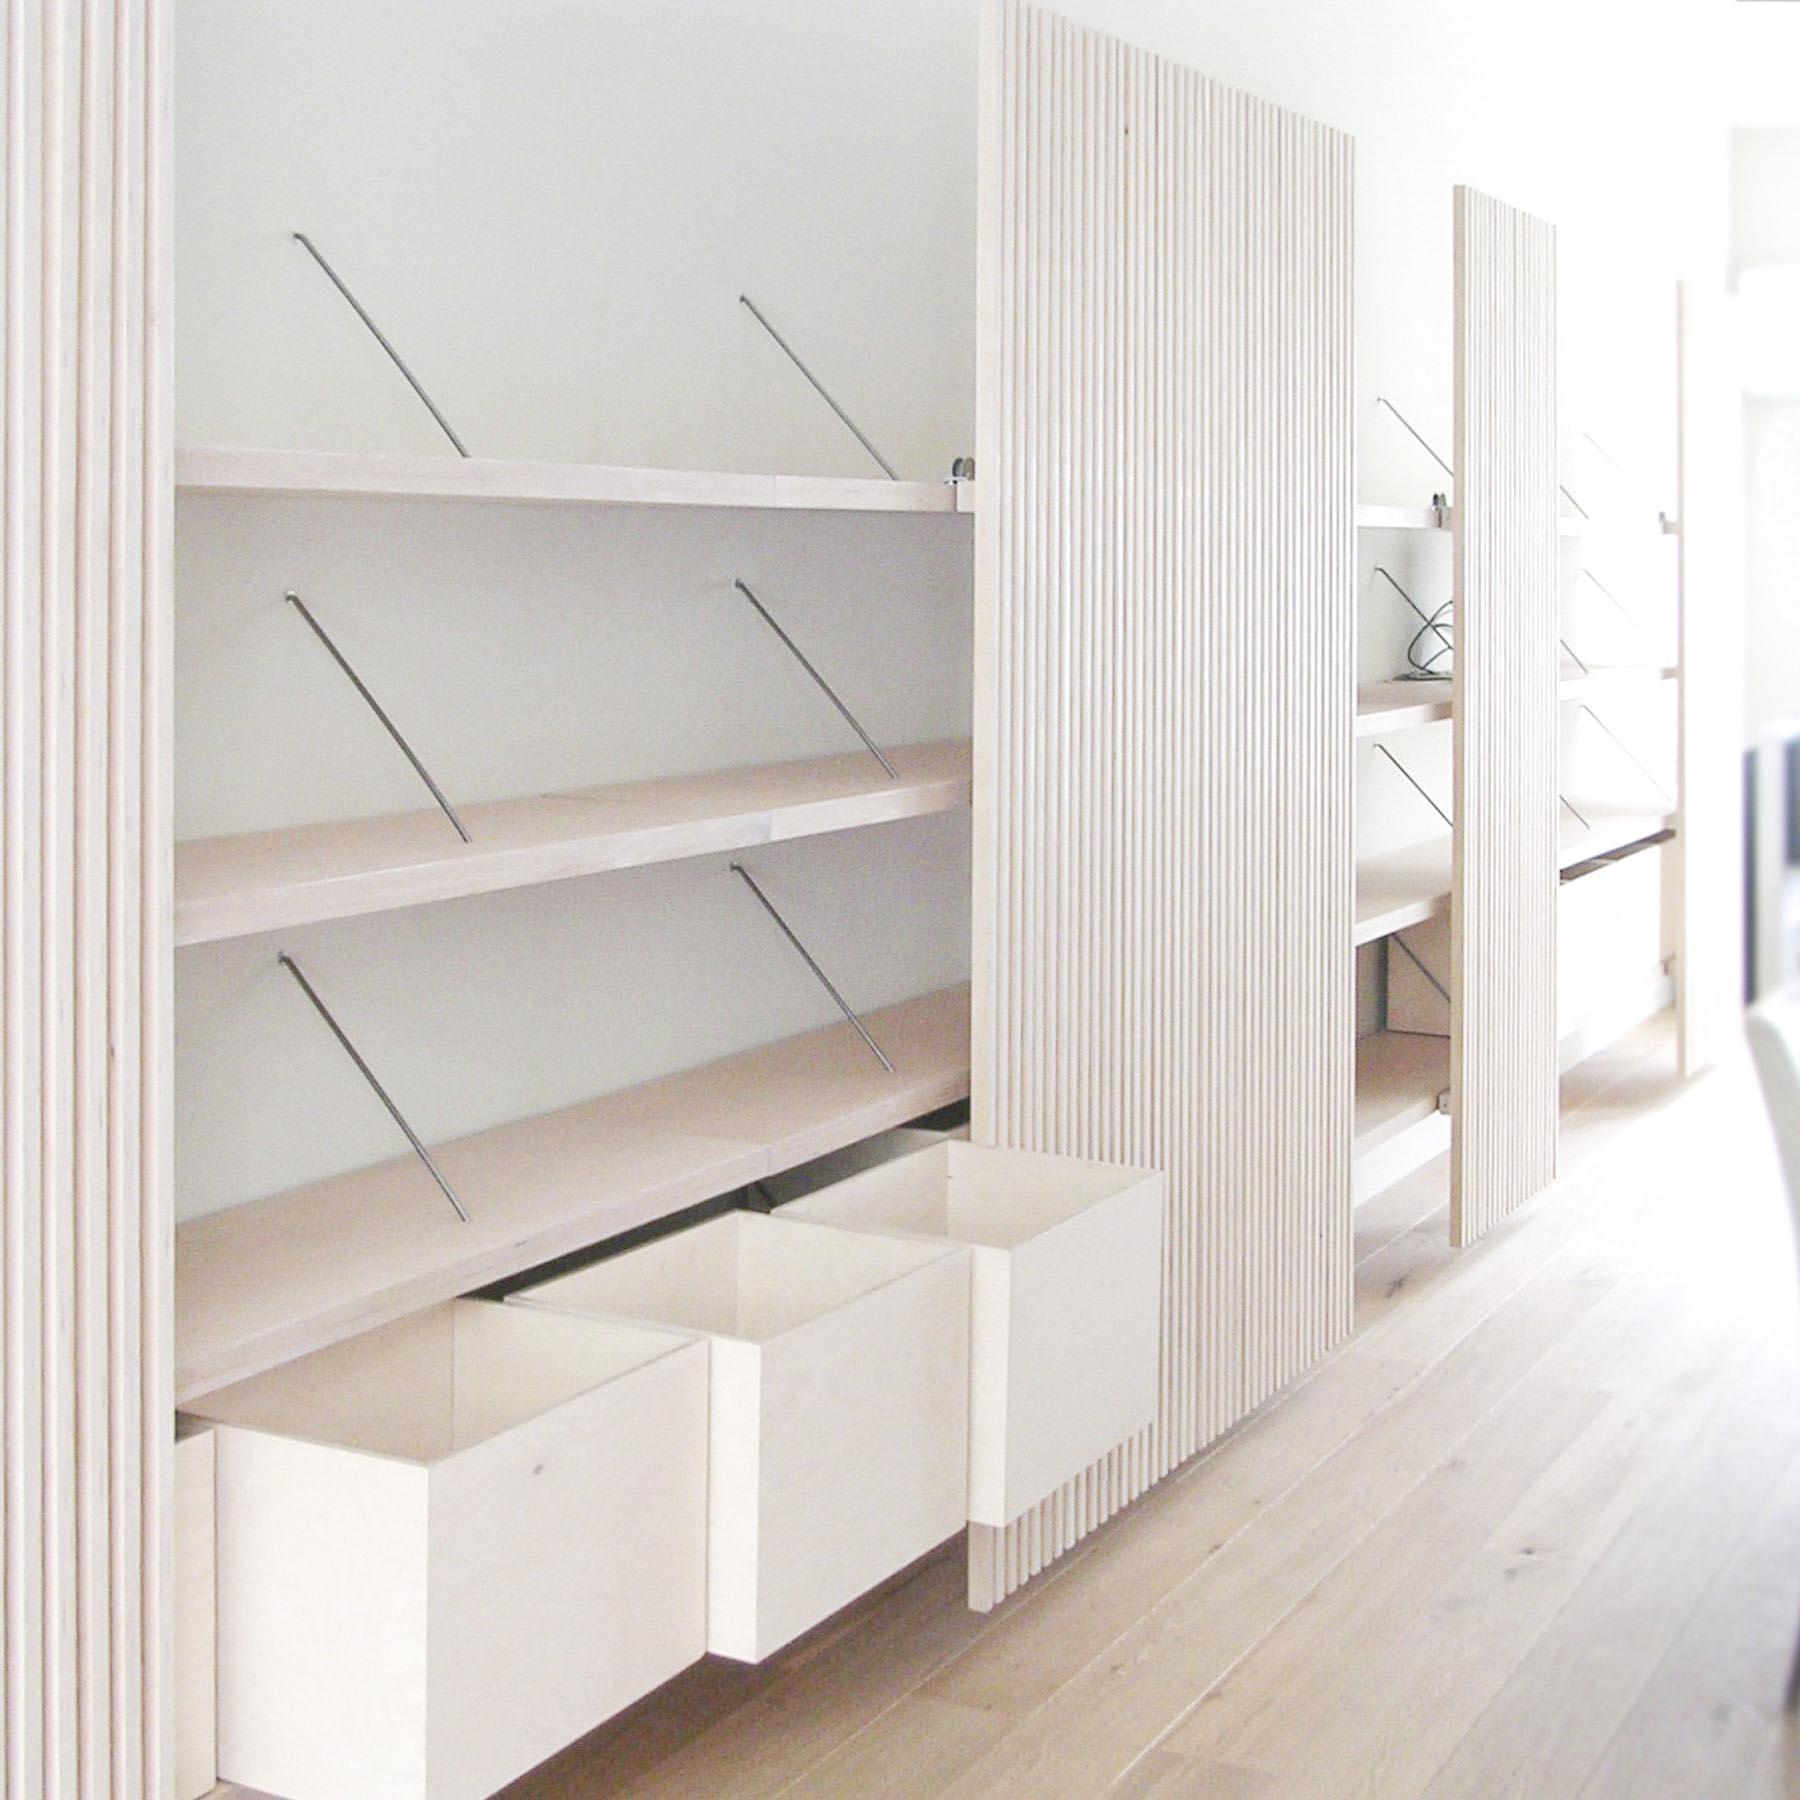 Wandkast 39 bright future 39 stijlapart for Meubels voor kleine ruimtes